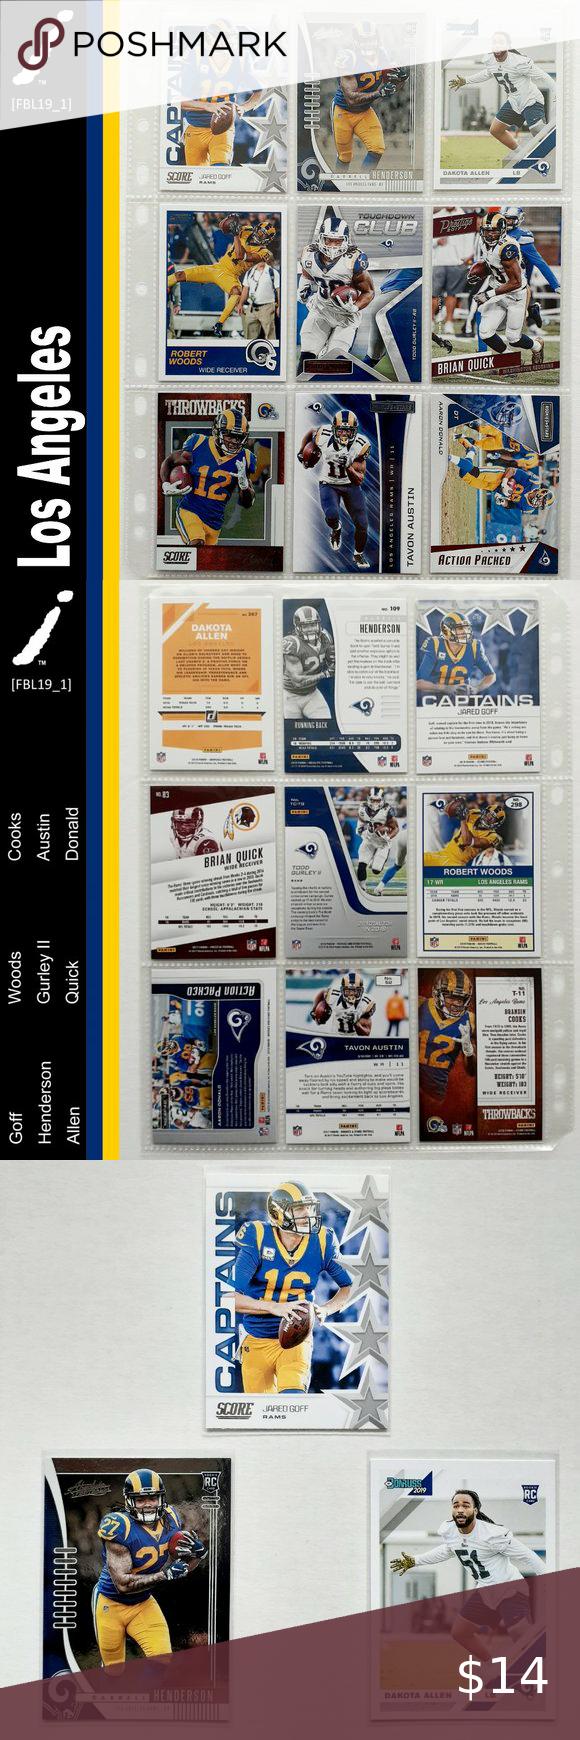 Los Angeles Rams 9 Card Lot Fbl19 1 In 2020 Los Angeles Rams Clothes Design Brighton Map